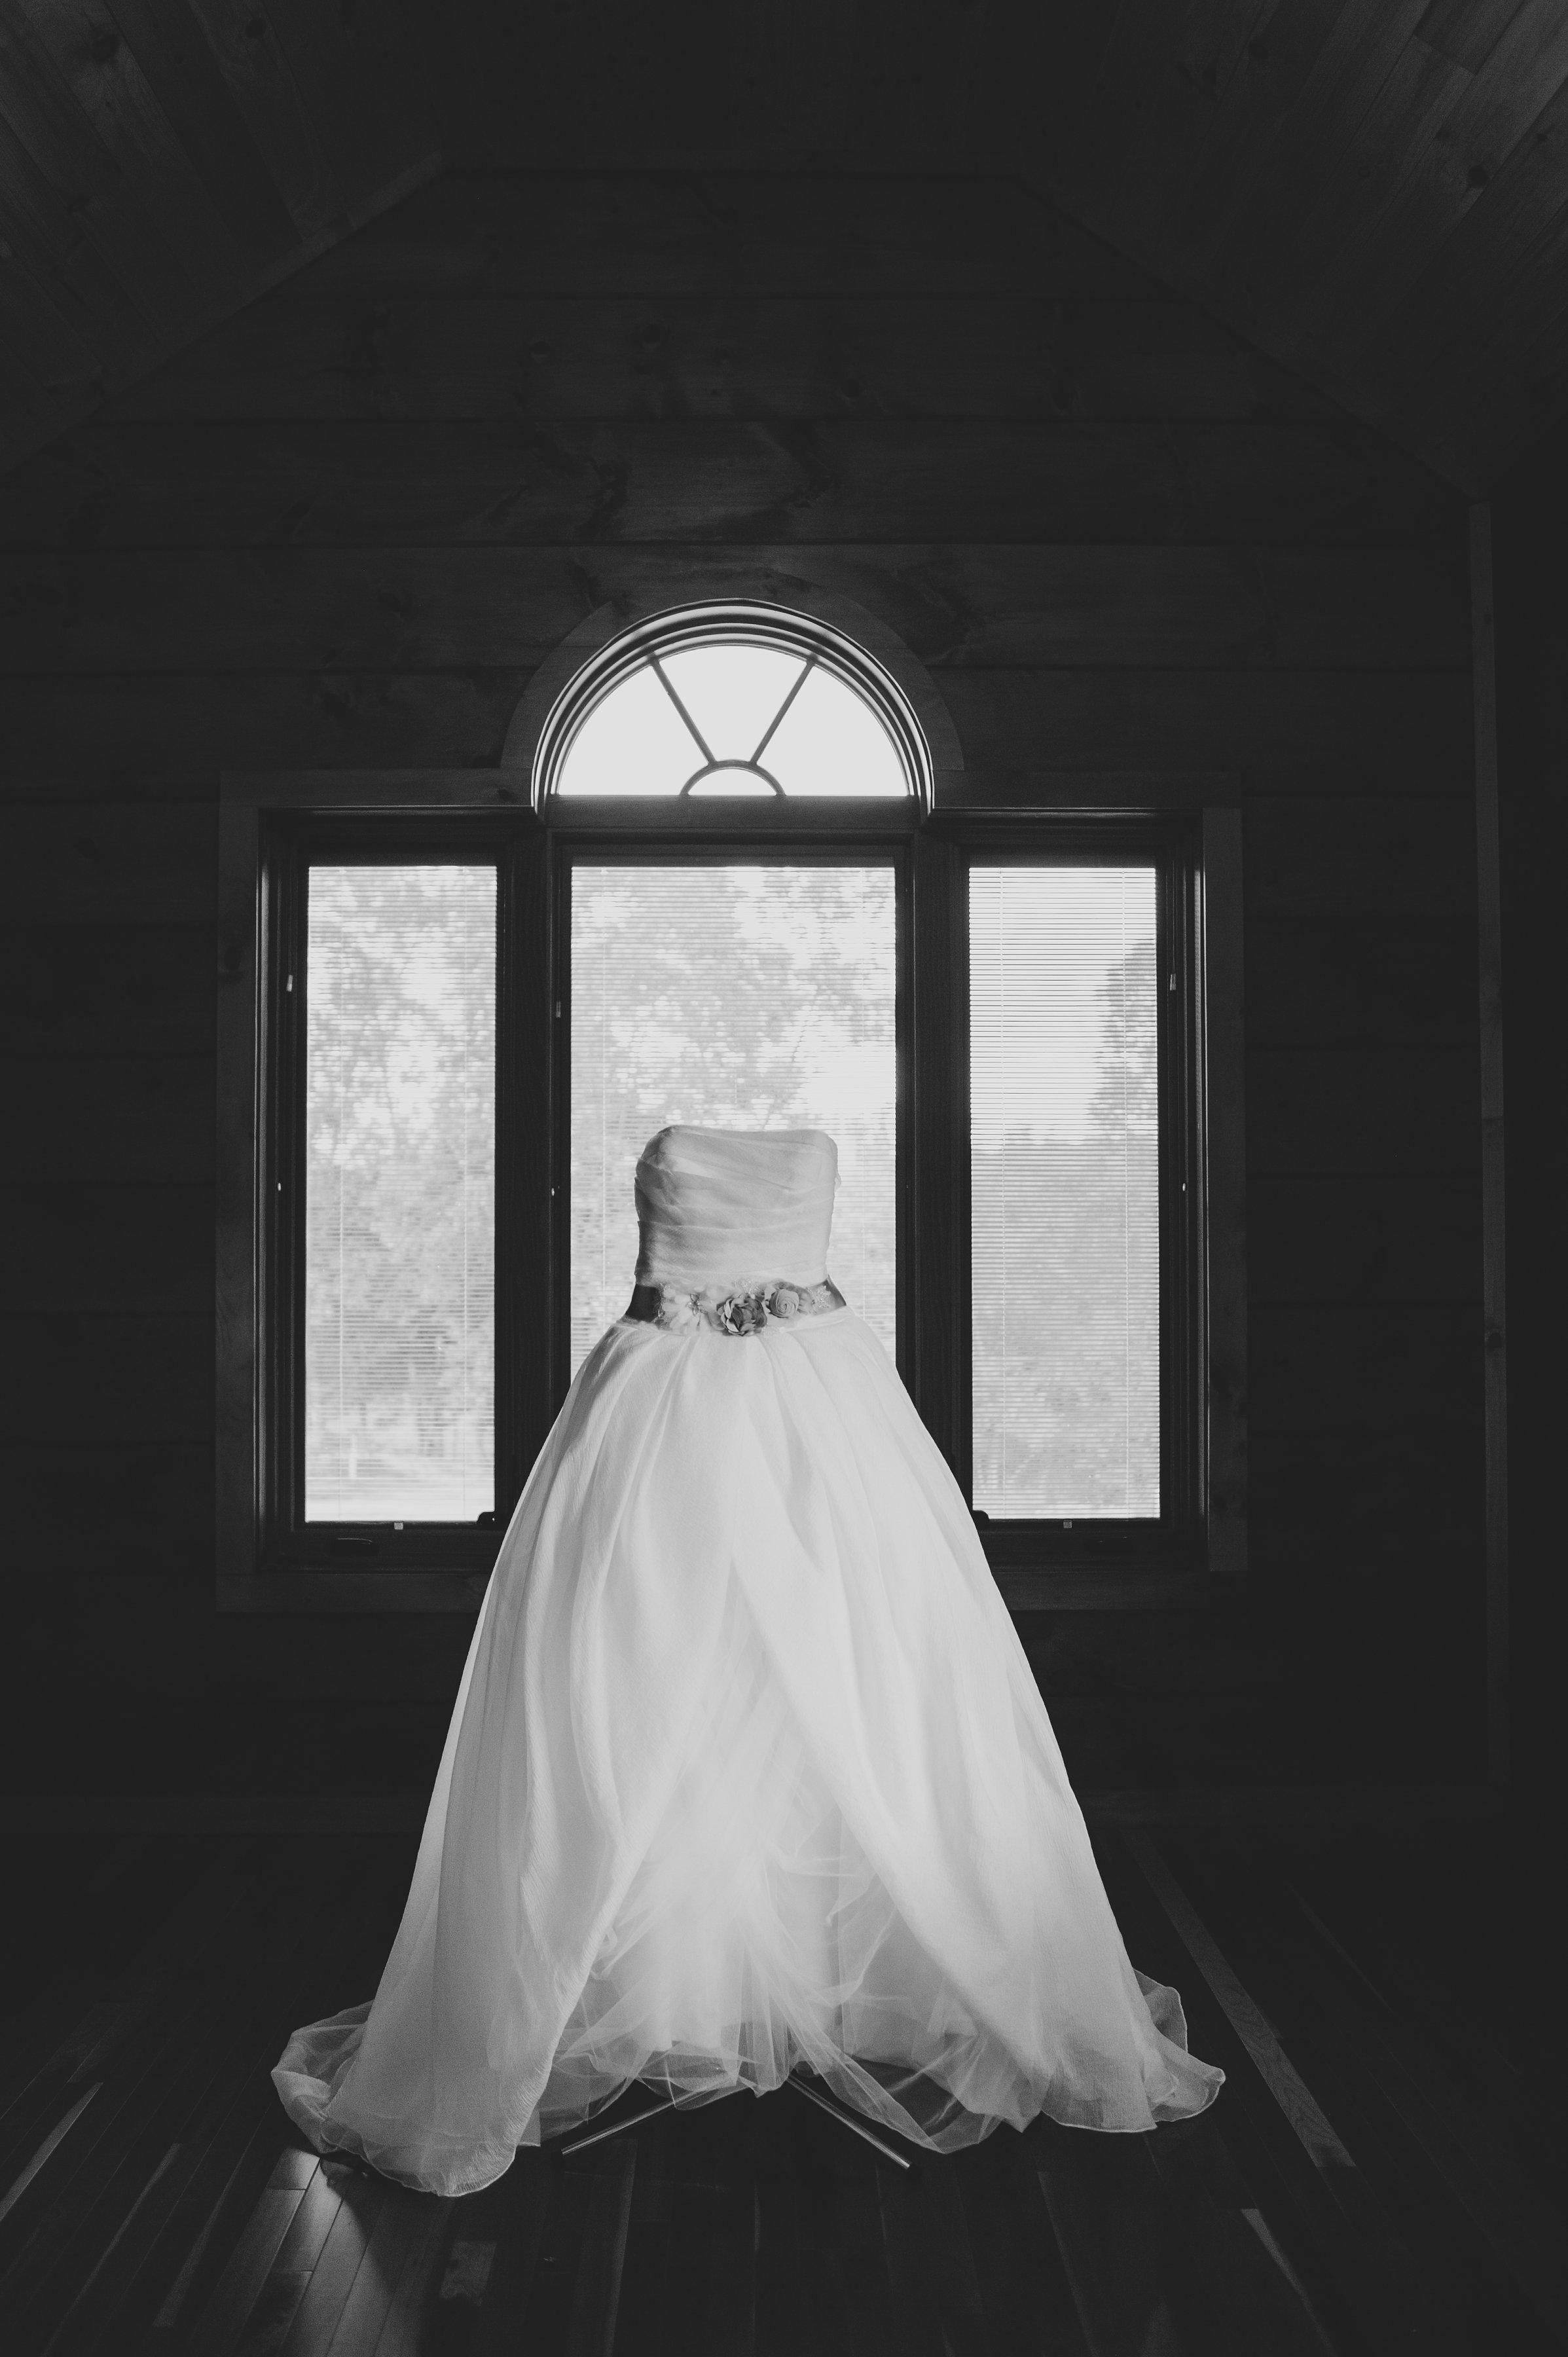 wedding-dress-black-and-white.jpg